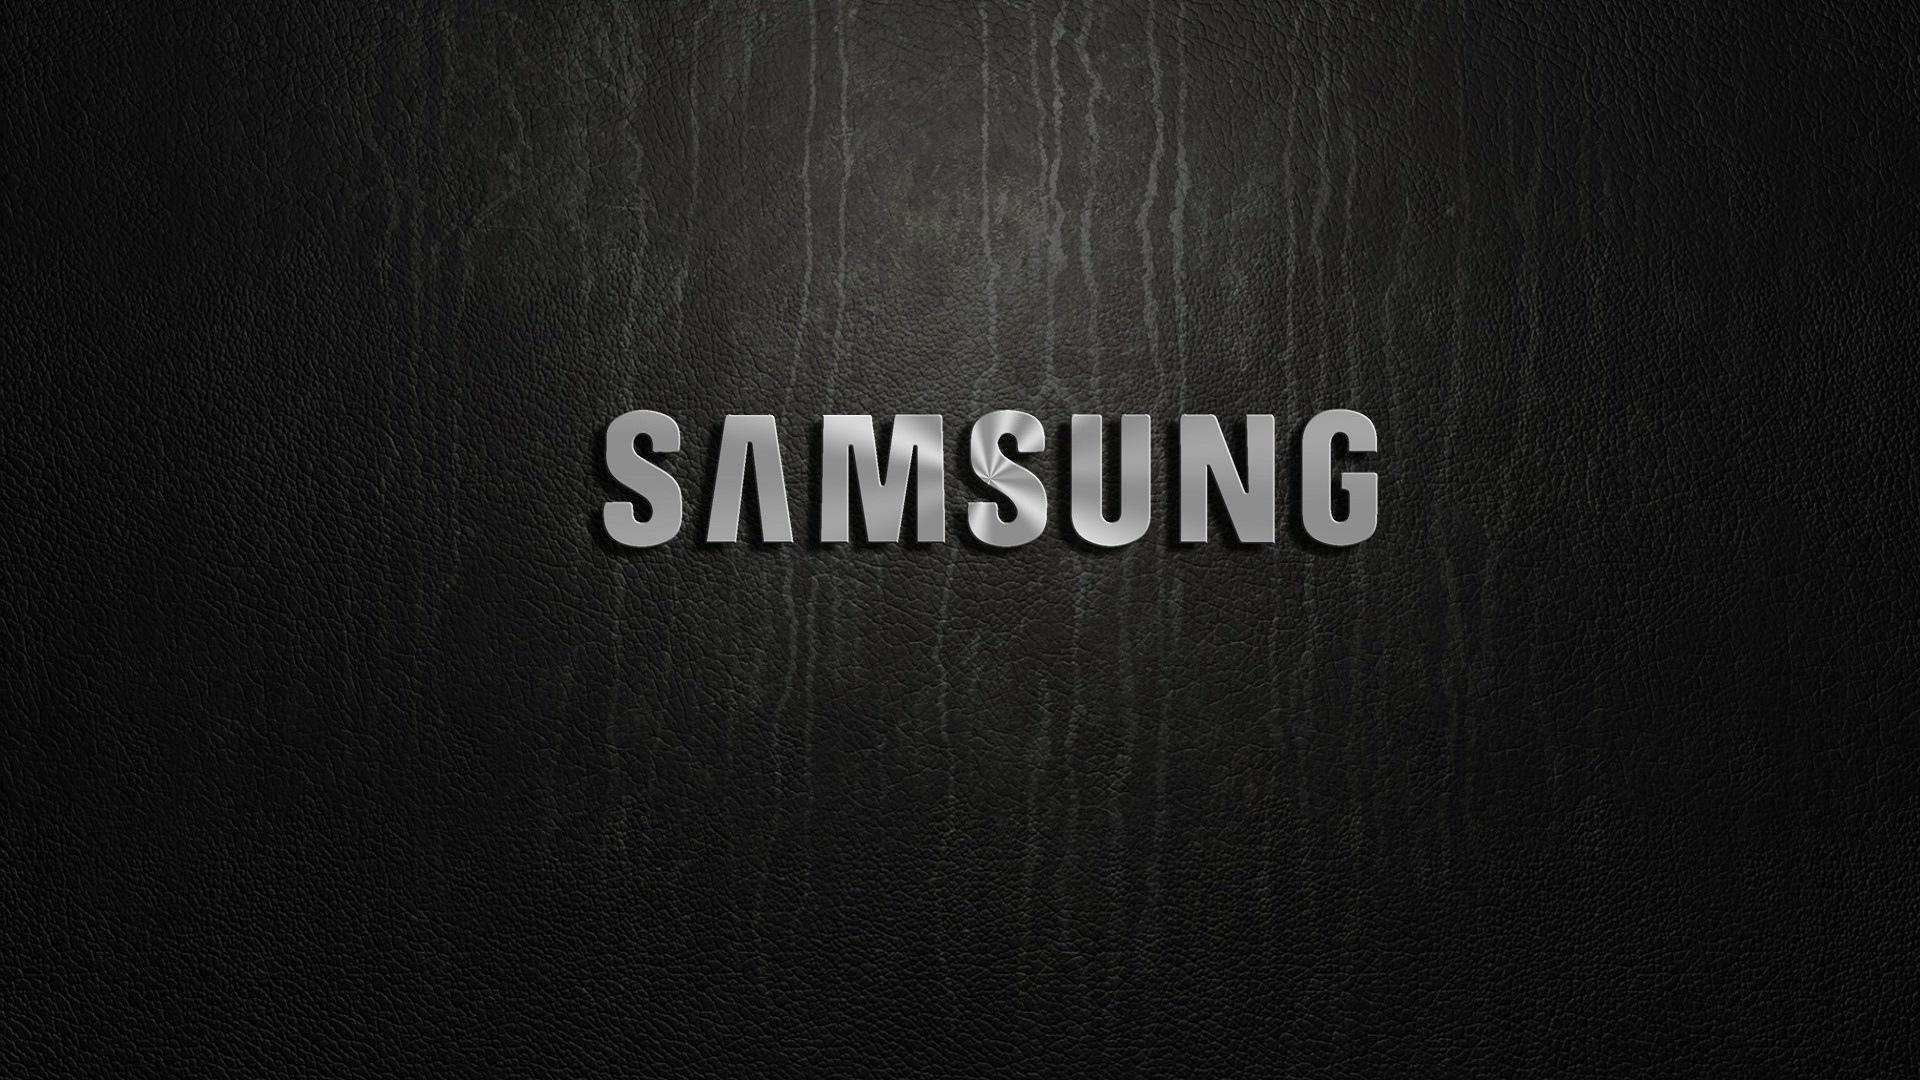 HDoboi.Kiev.ua - Samsung logo wallpaper, Самсунг логотип, бренды